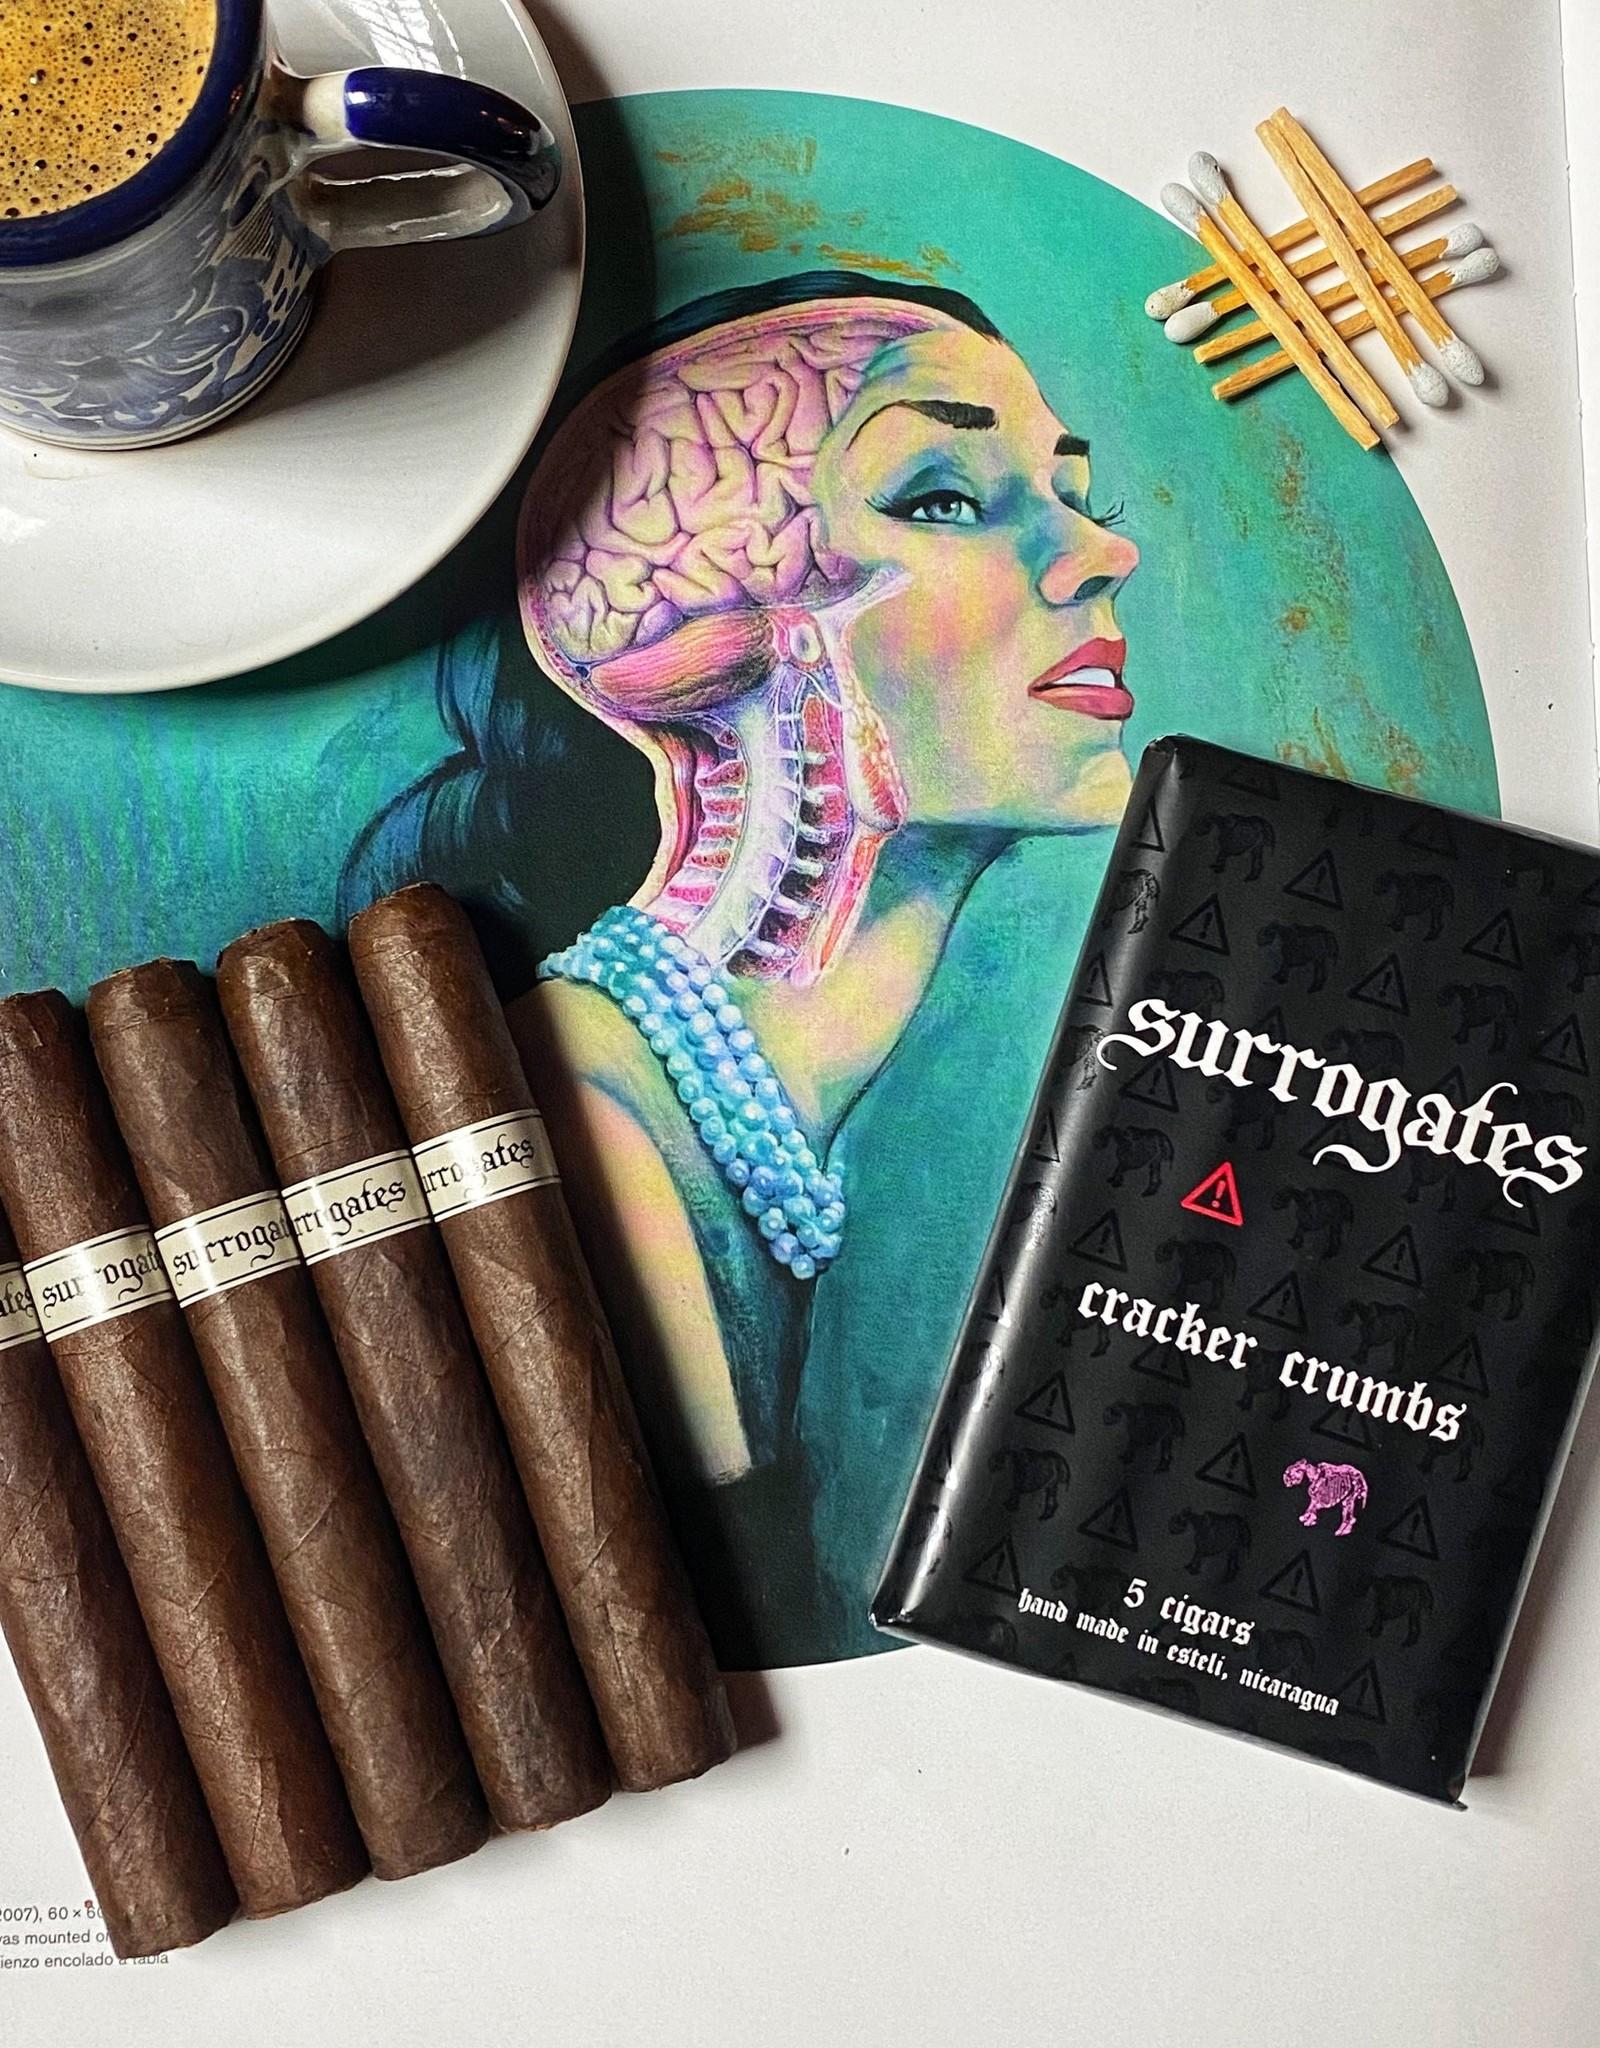 Tatuaje Tatuaje Surrogates Cracker Crumbs 4.5 x 38 Five Pack